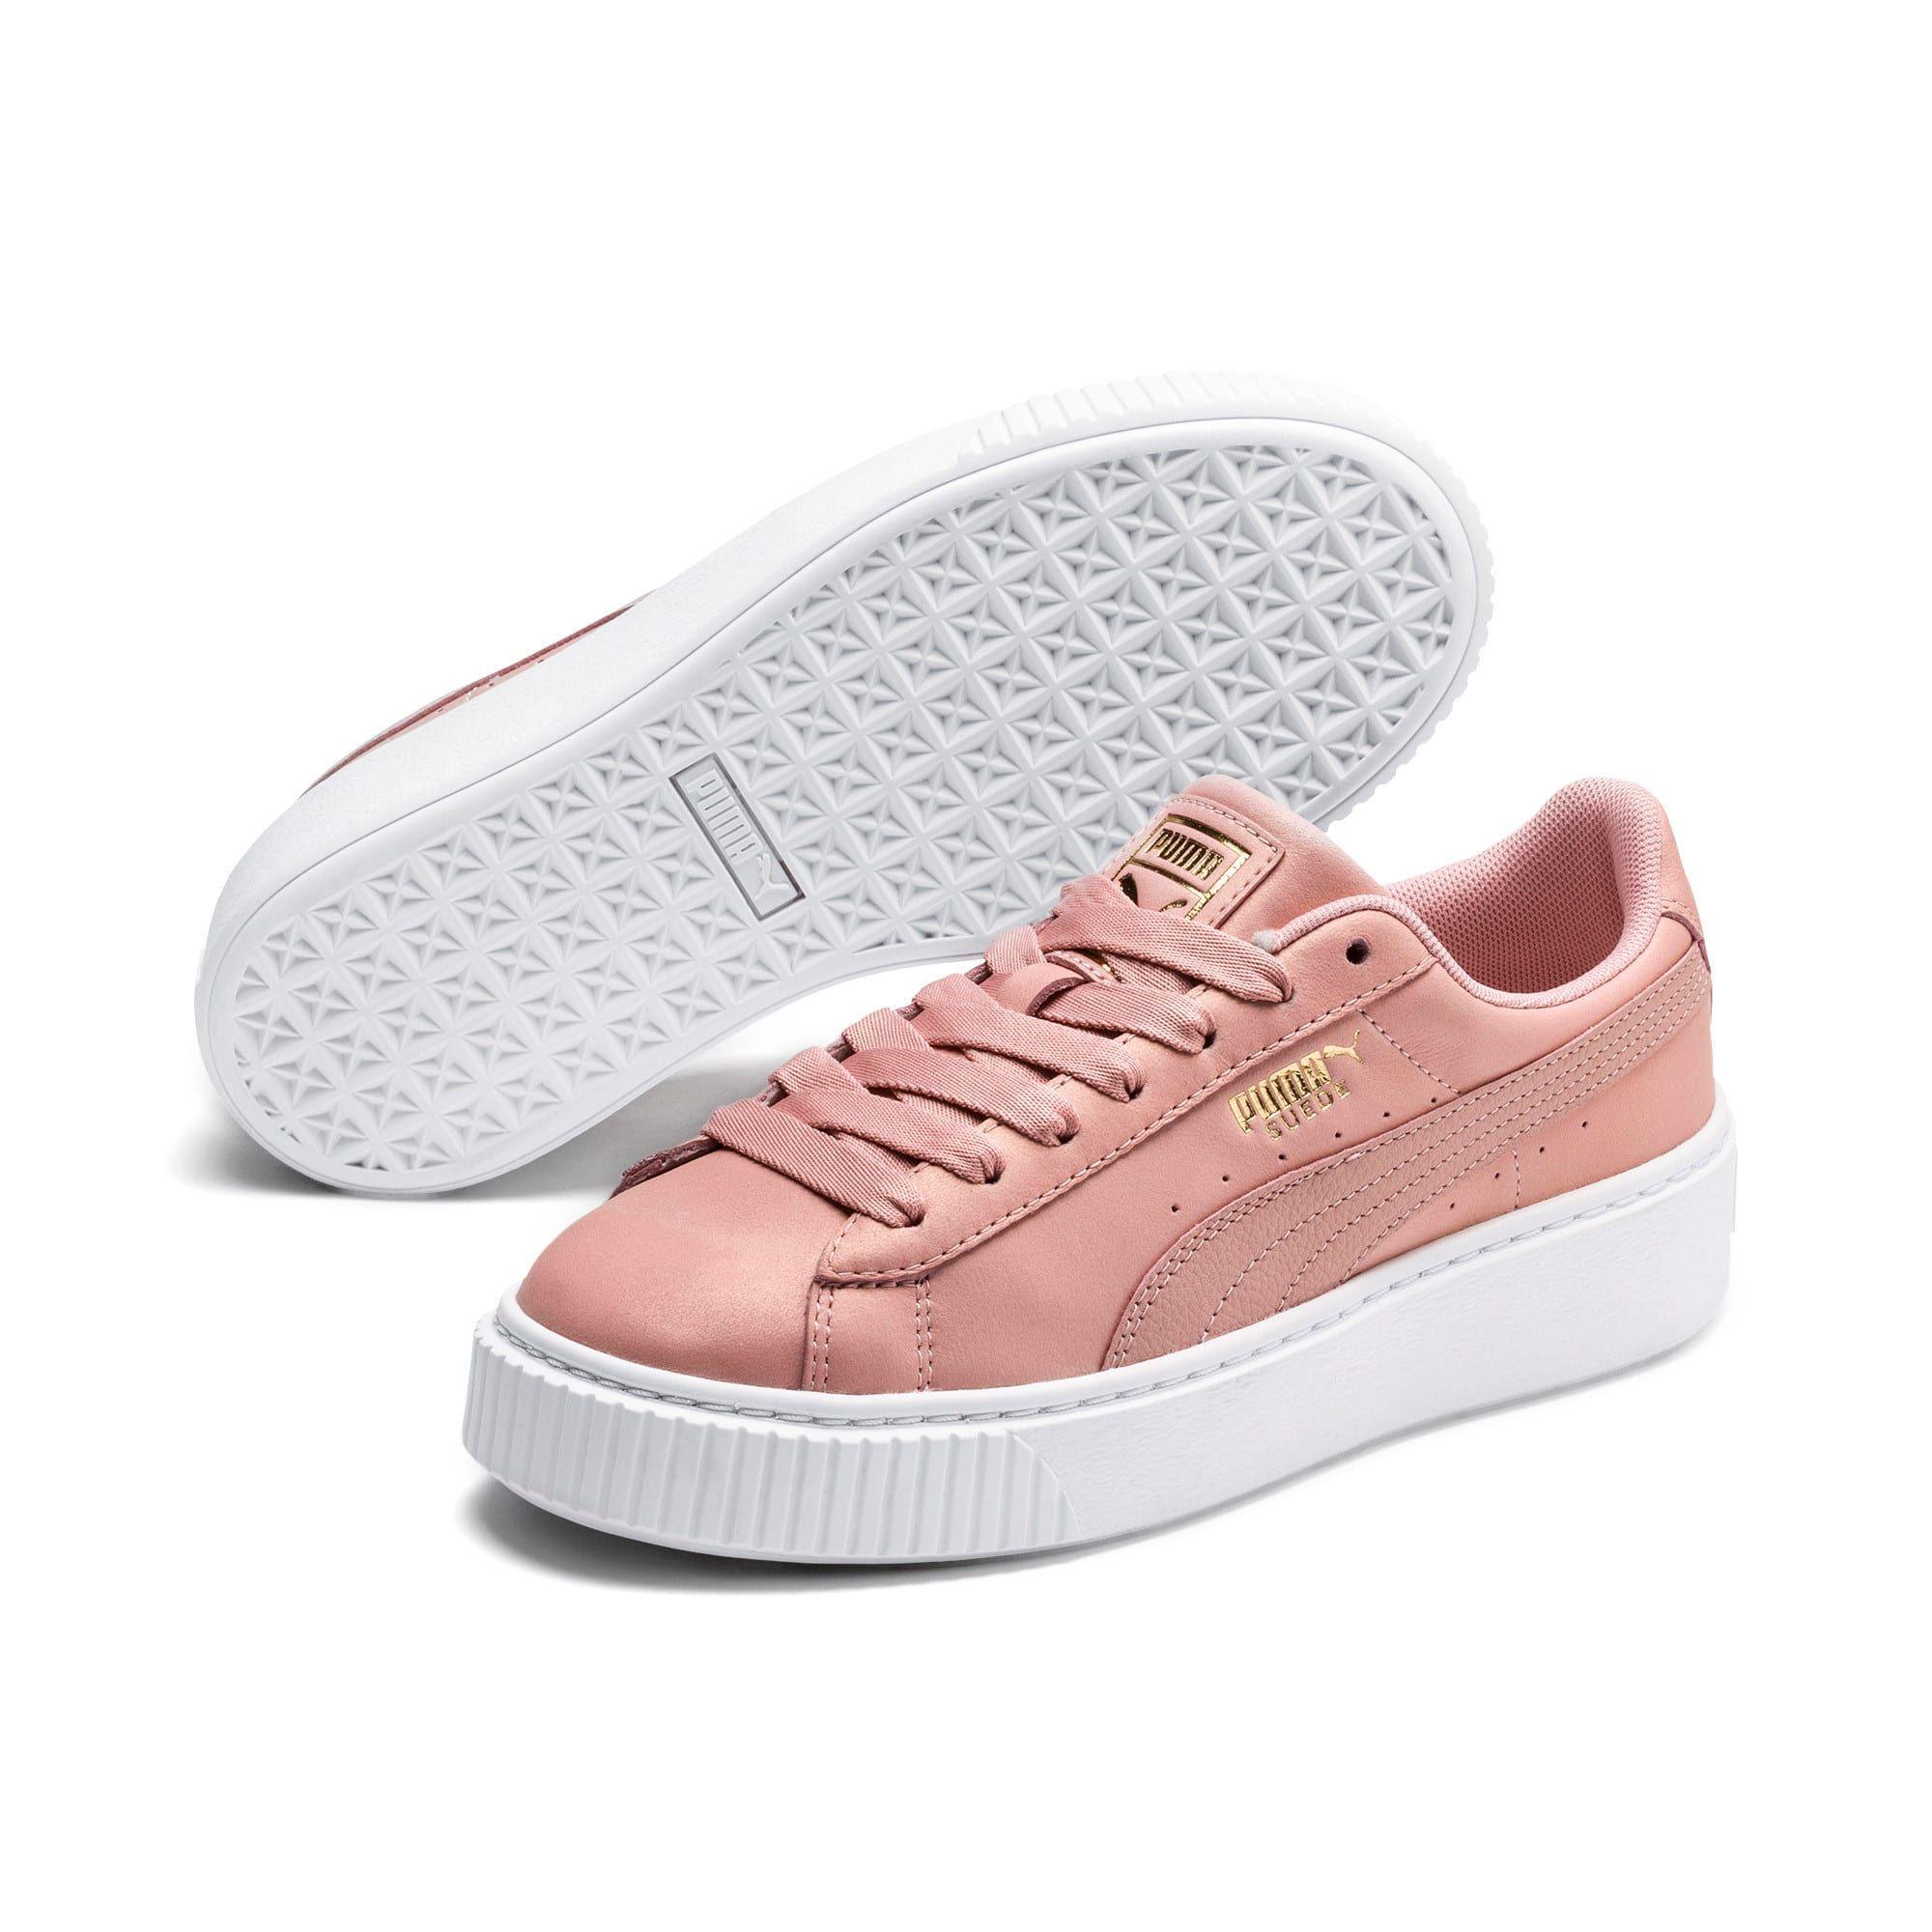 chaussure puma suede femme rose